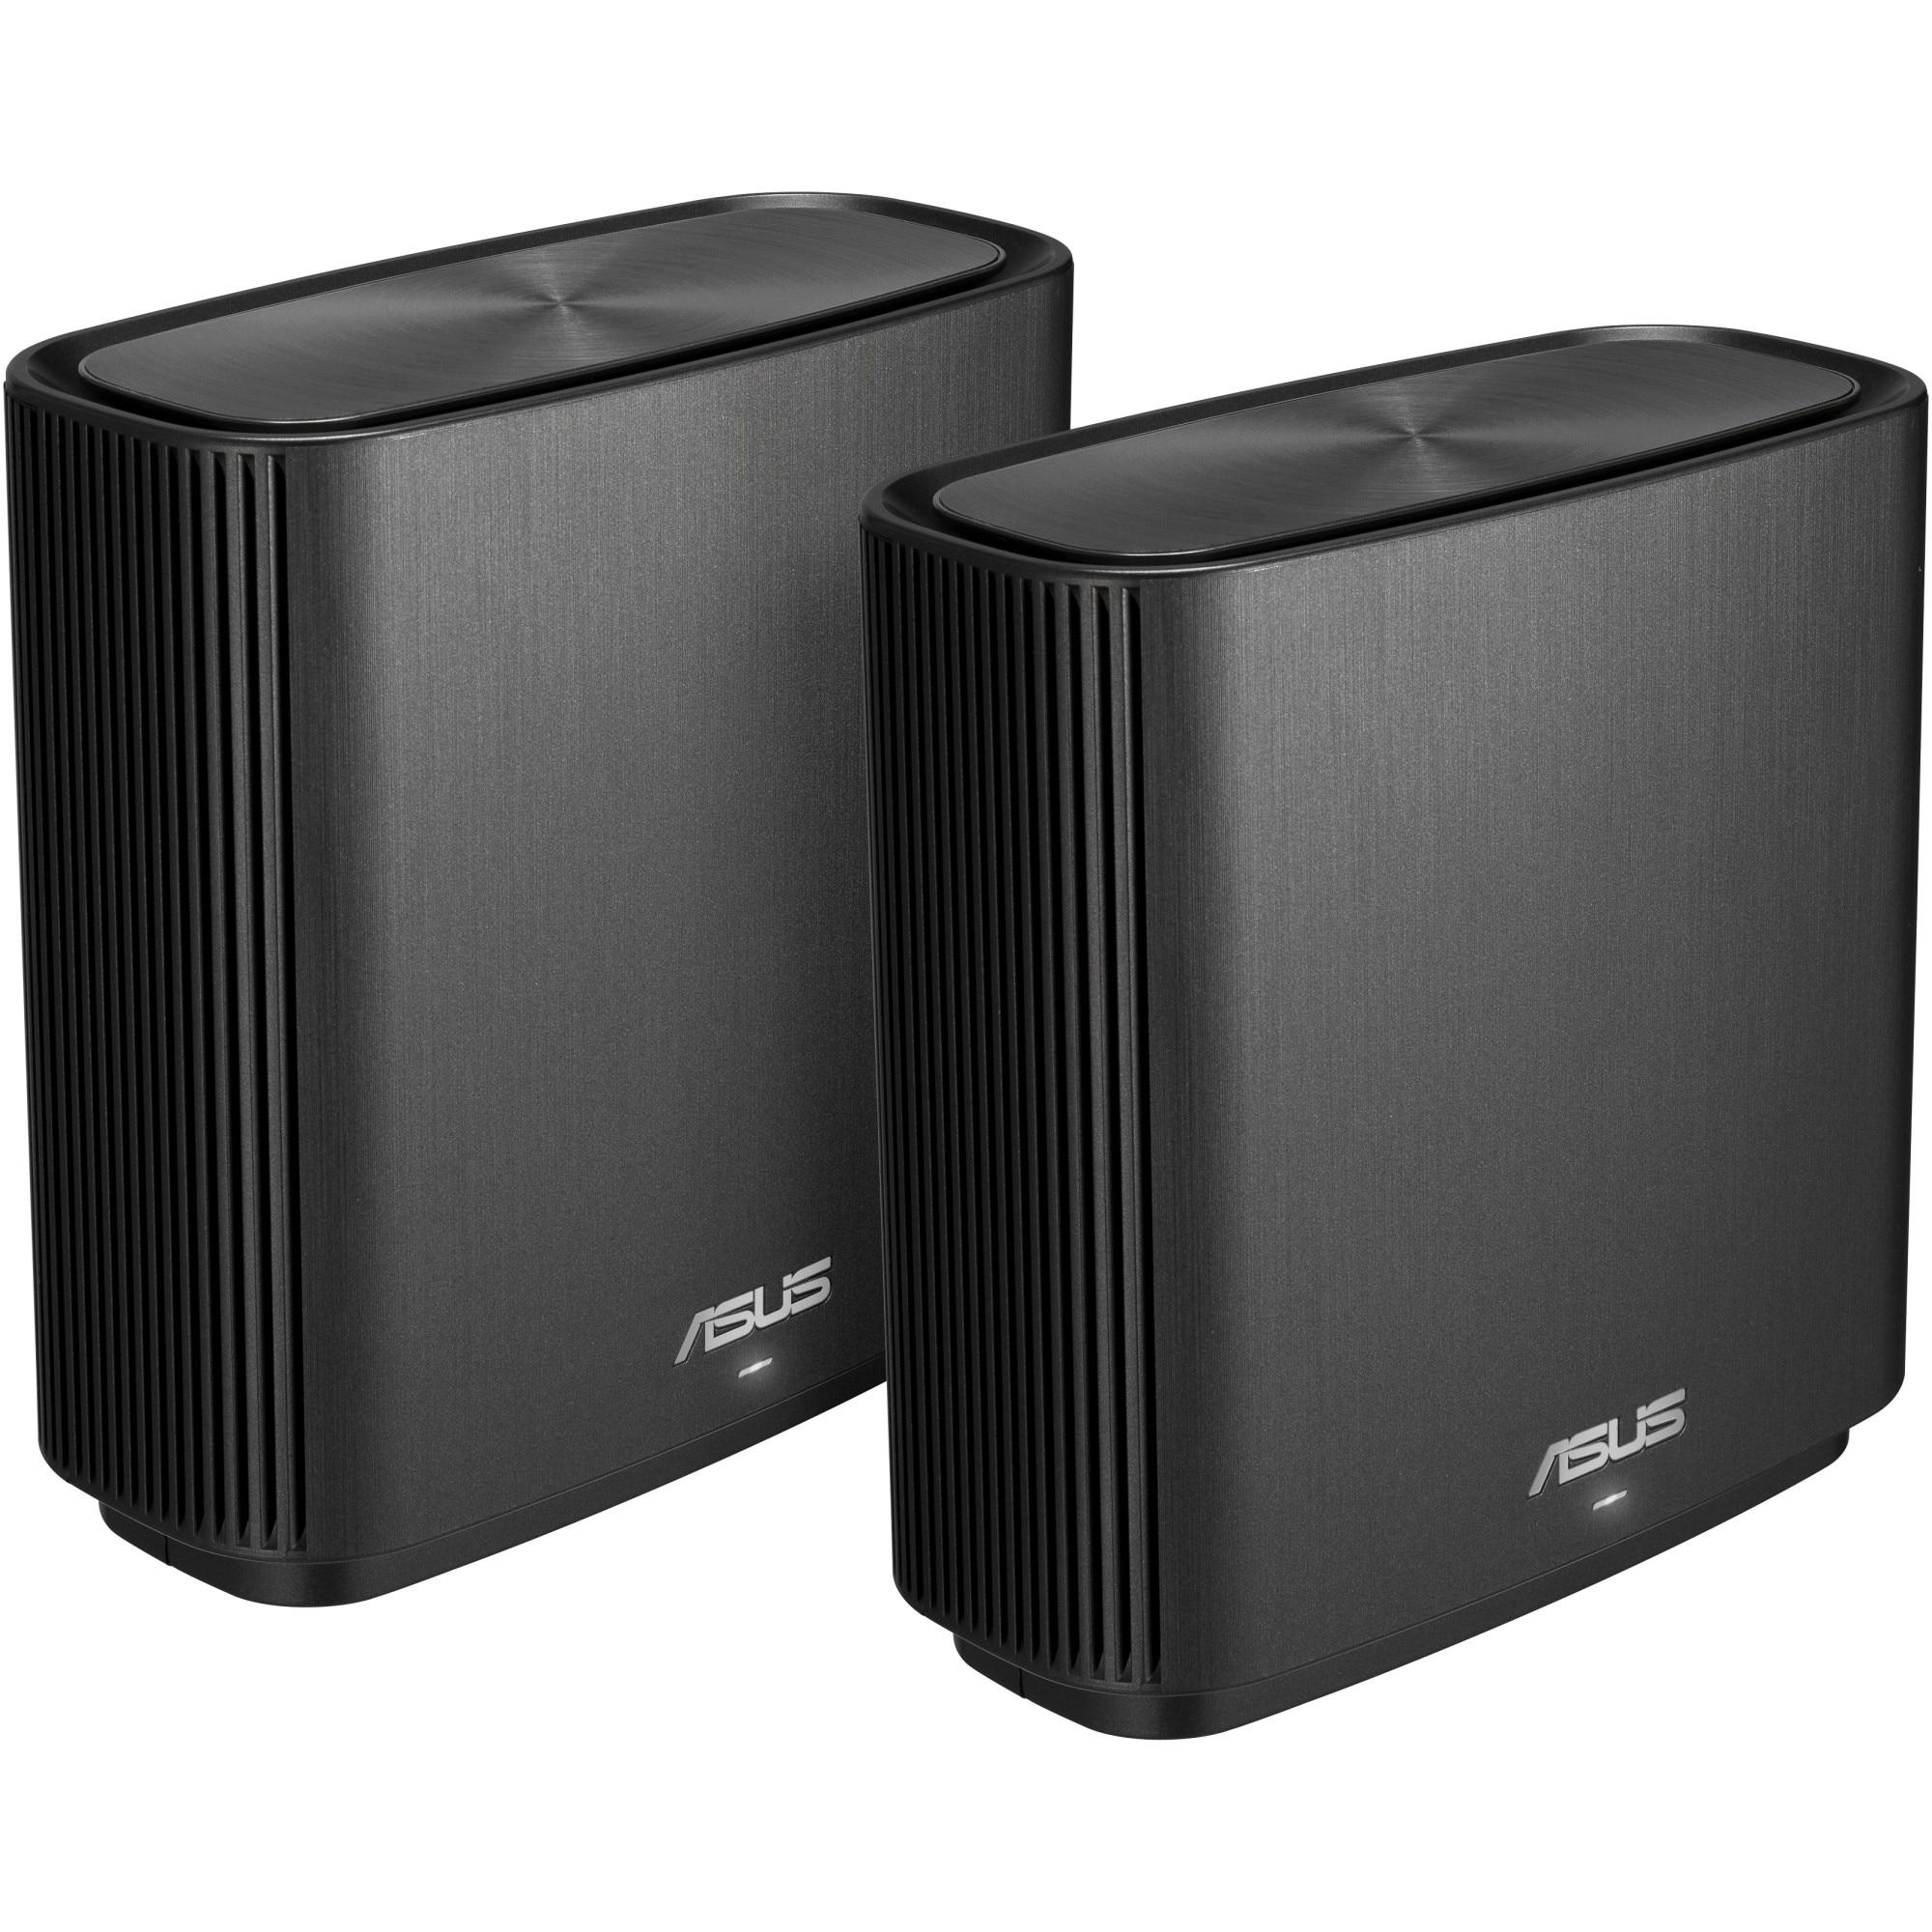 Fotografie Sistem Wi-Fi Mesh ASUS ZenWifi CT8, MU-MIMO, AC3000, Black